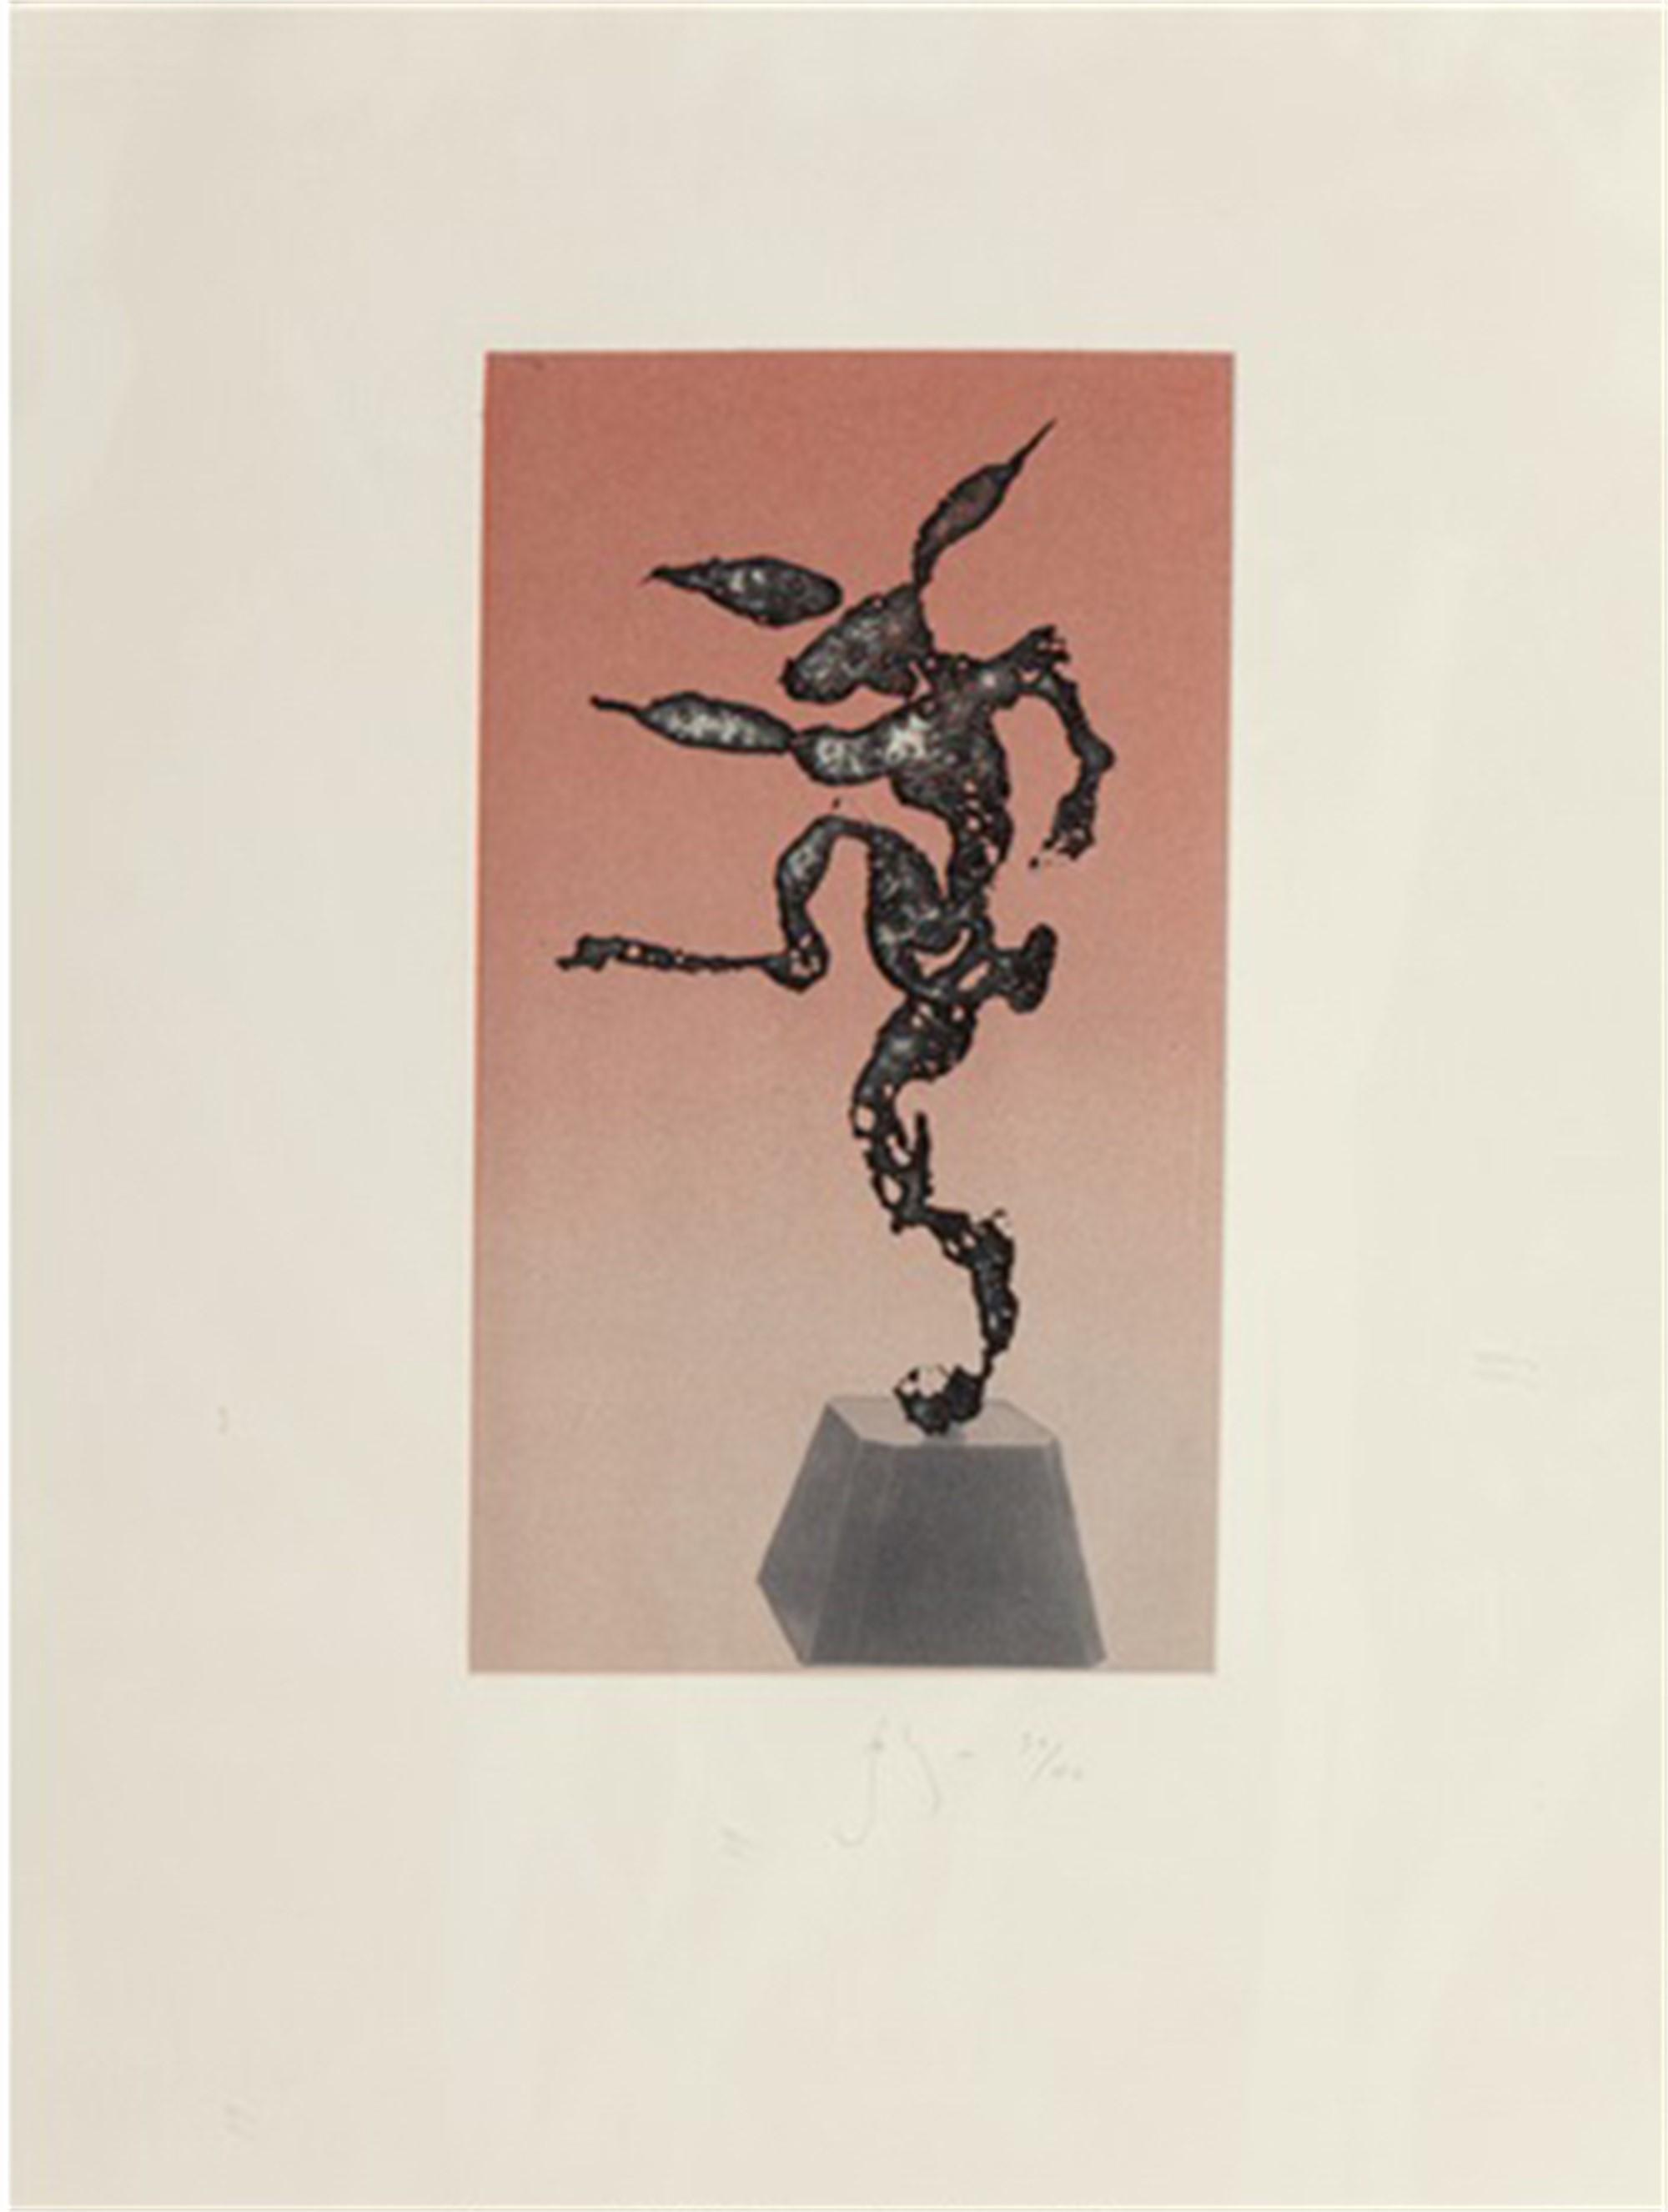 Nijinsky (Hare) by Barry Flanagan